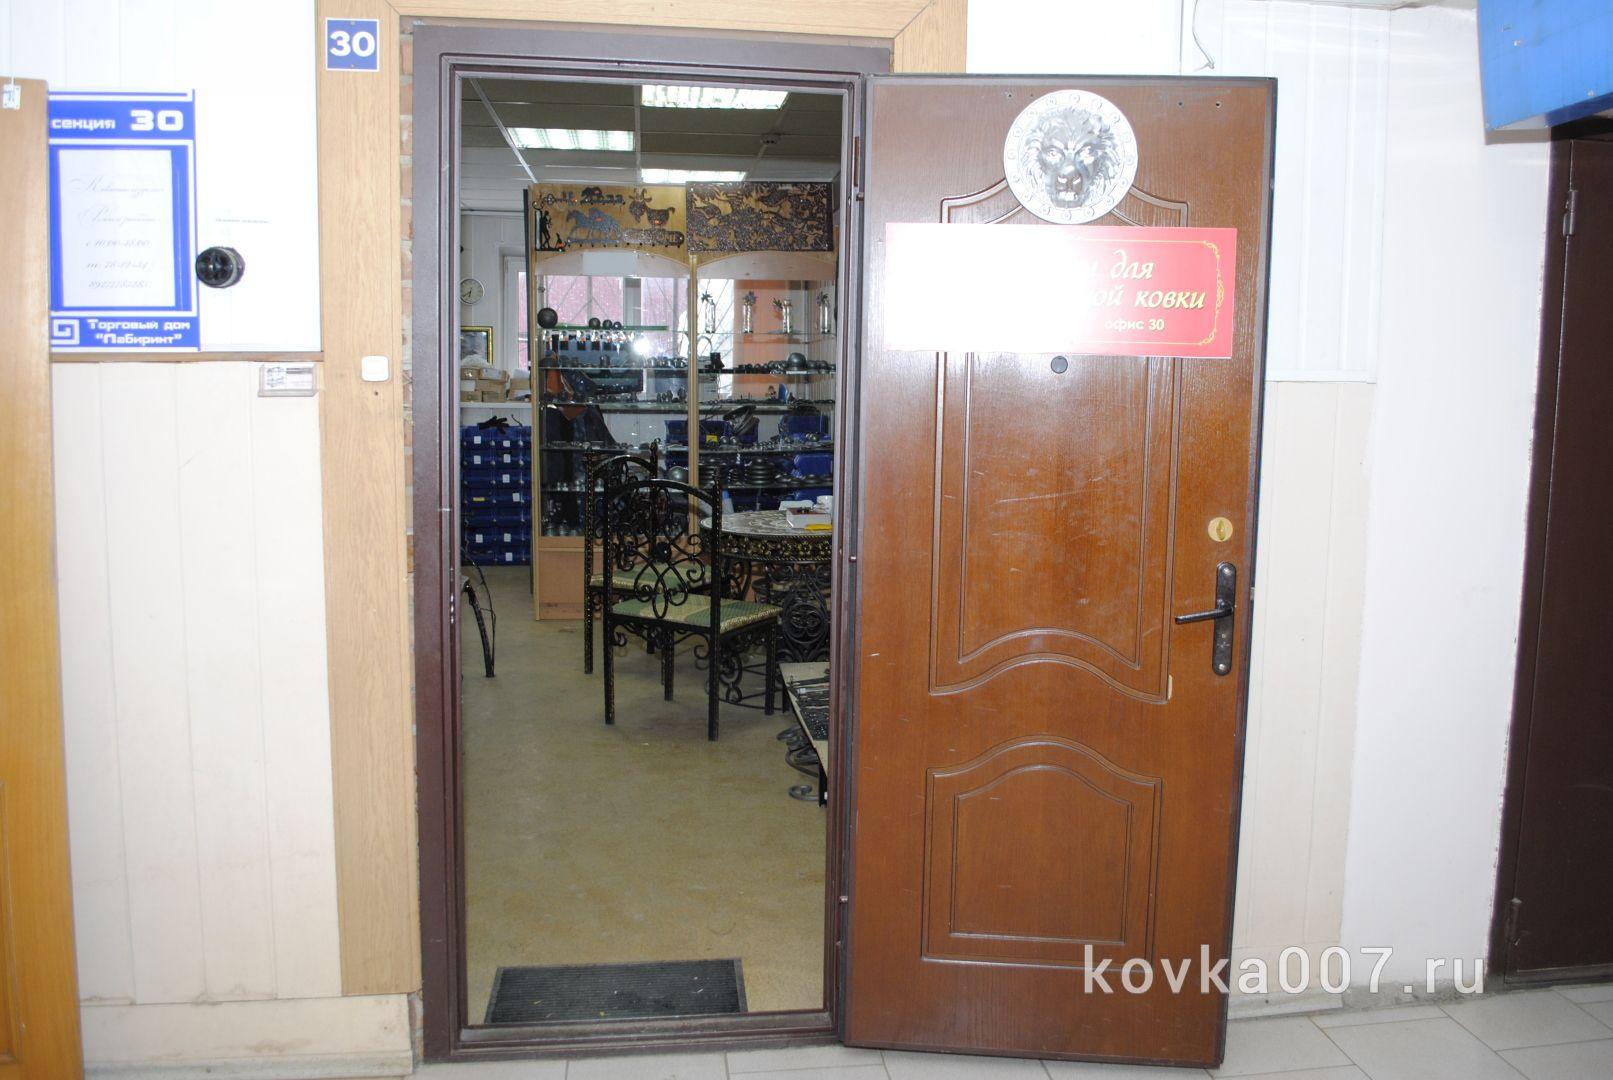 kovka007 Тольятти